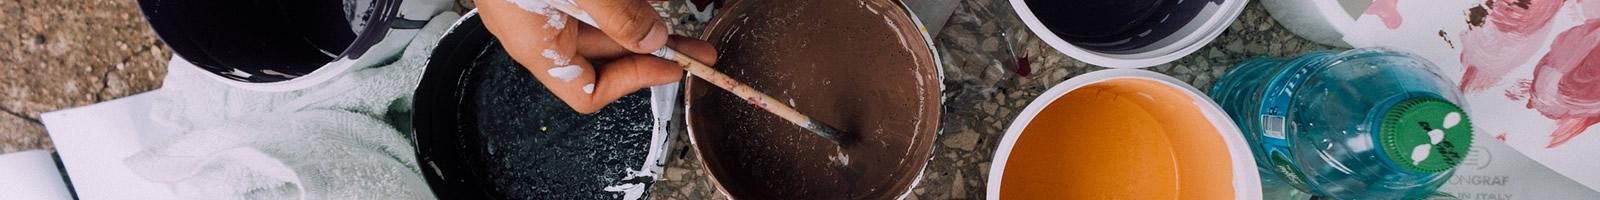 Dohmen Malermeister